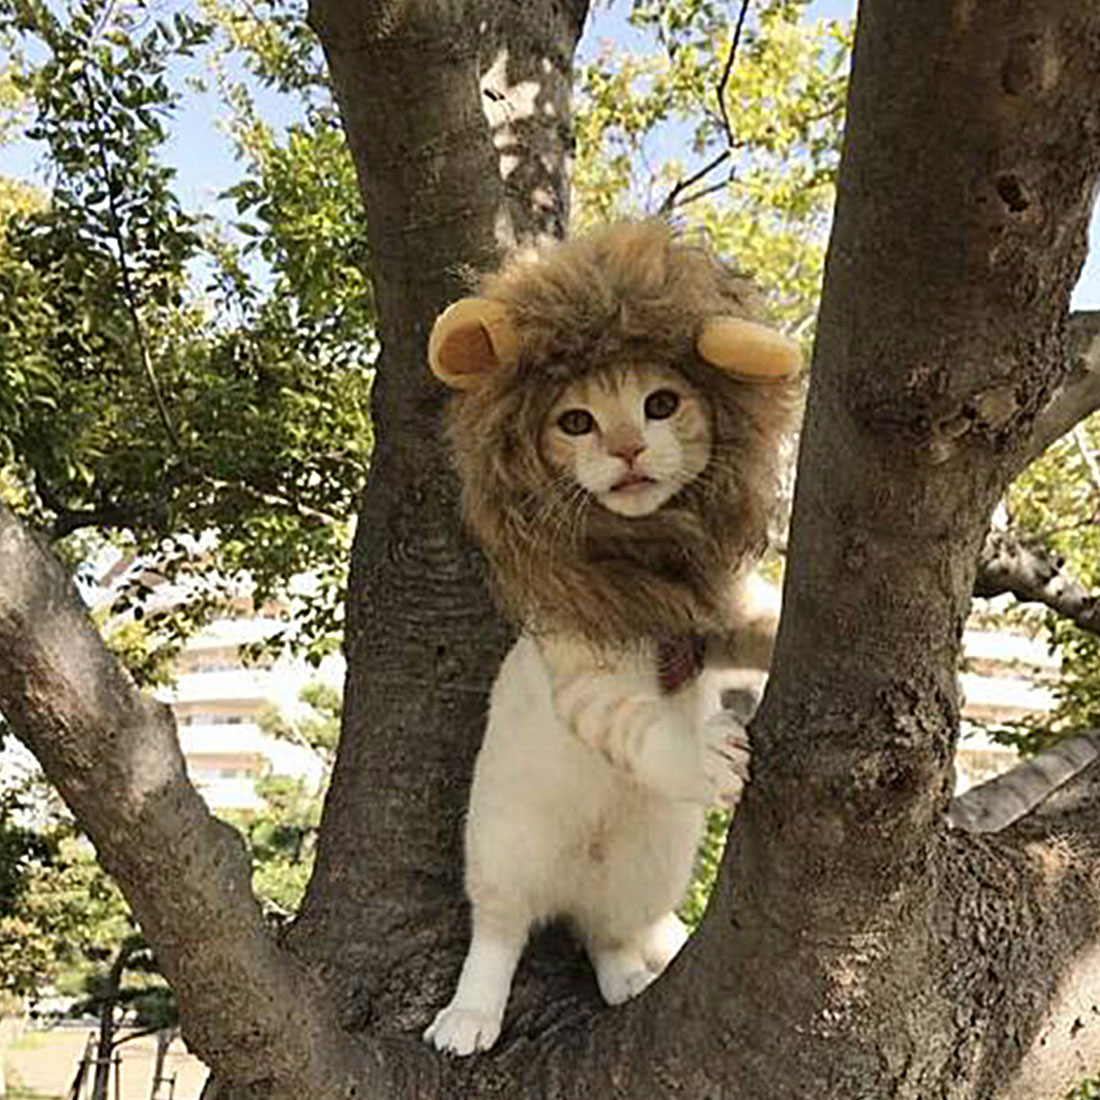 1 Stück Haustier Katze Hund Kleid Up Kostüm Perücke Emulation Löwe Haar Mähne Ohren Kopf Kappe Herbst Winter Muffler Schal Pet Produkte